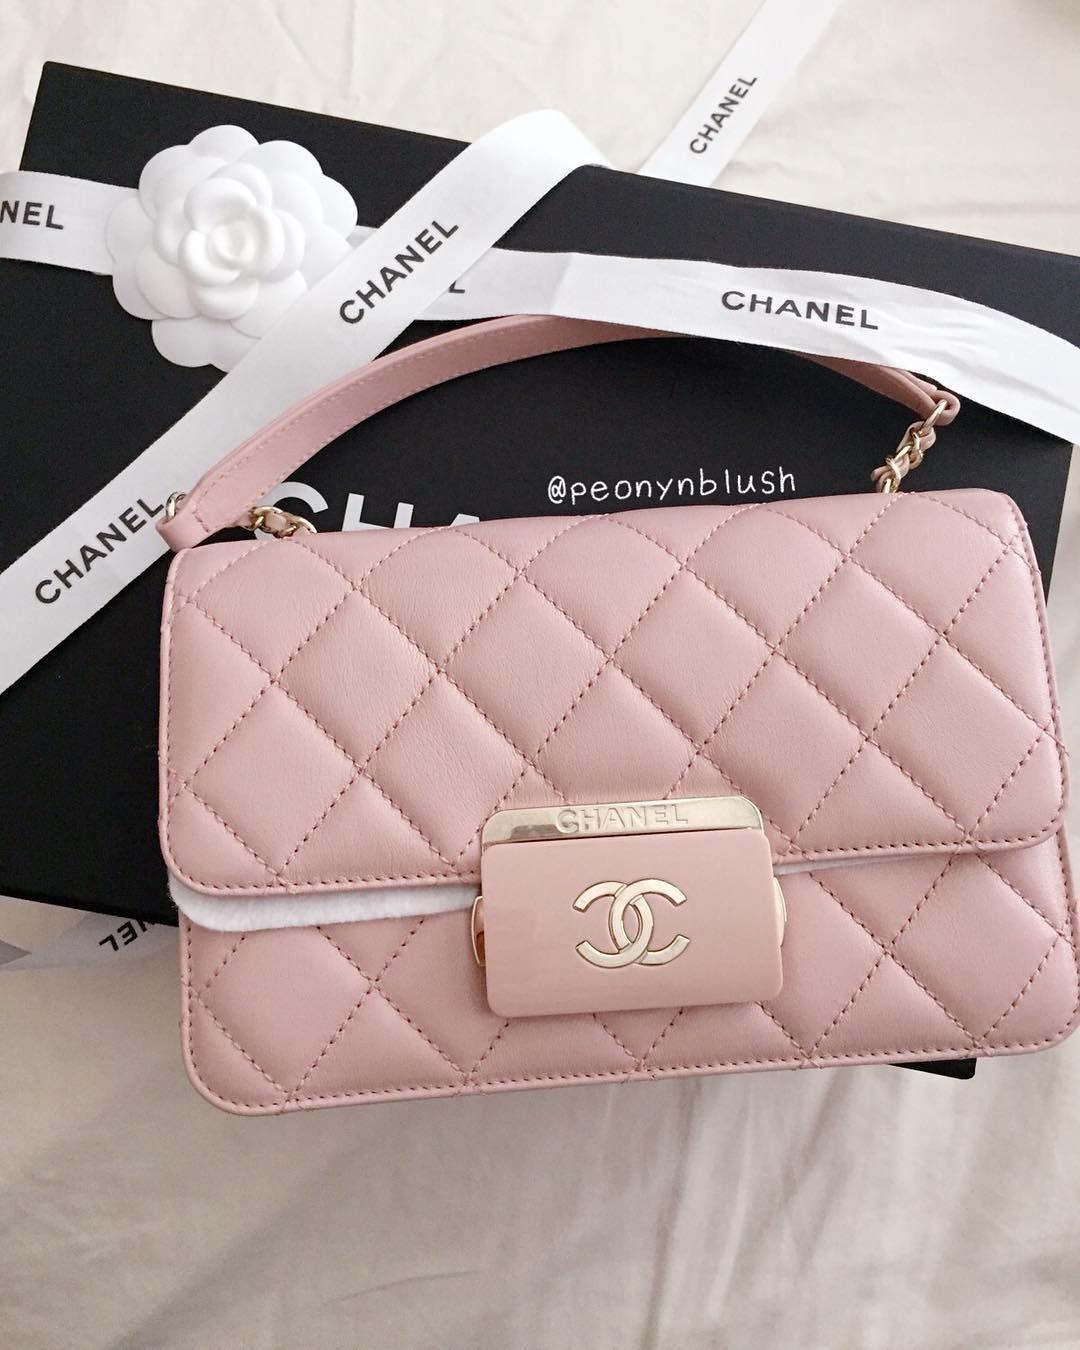 Chanel Flap Bag For Fashion Women. Best Accessories To Wear.  Chanel   Handbags fe21eebd5